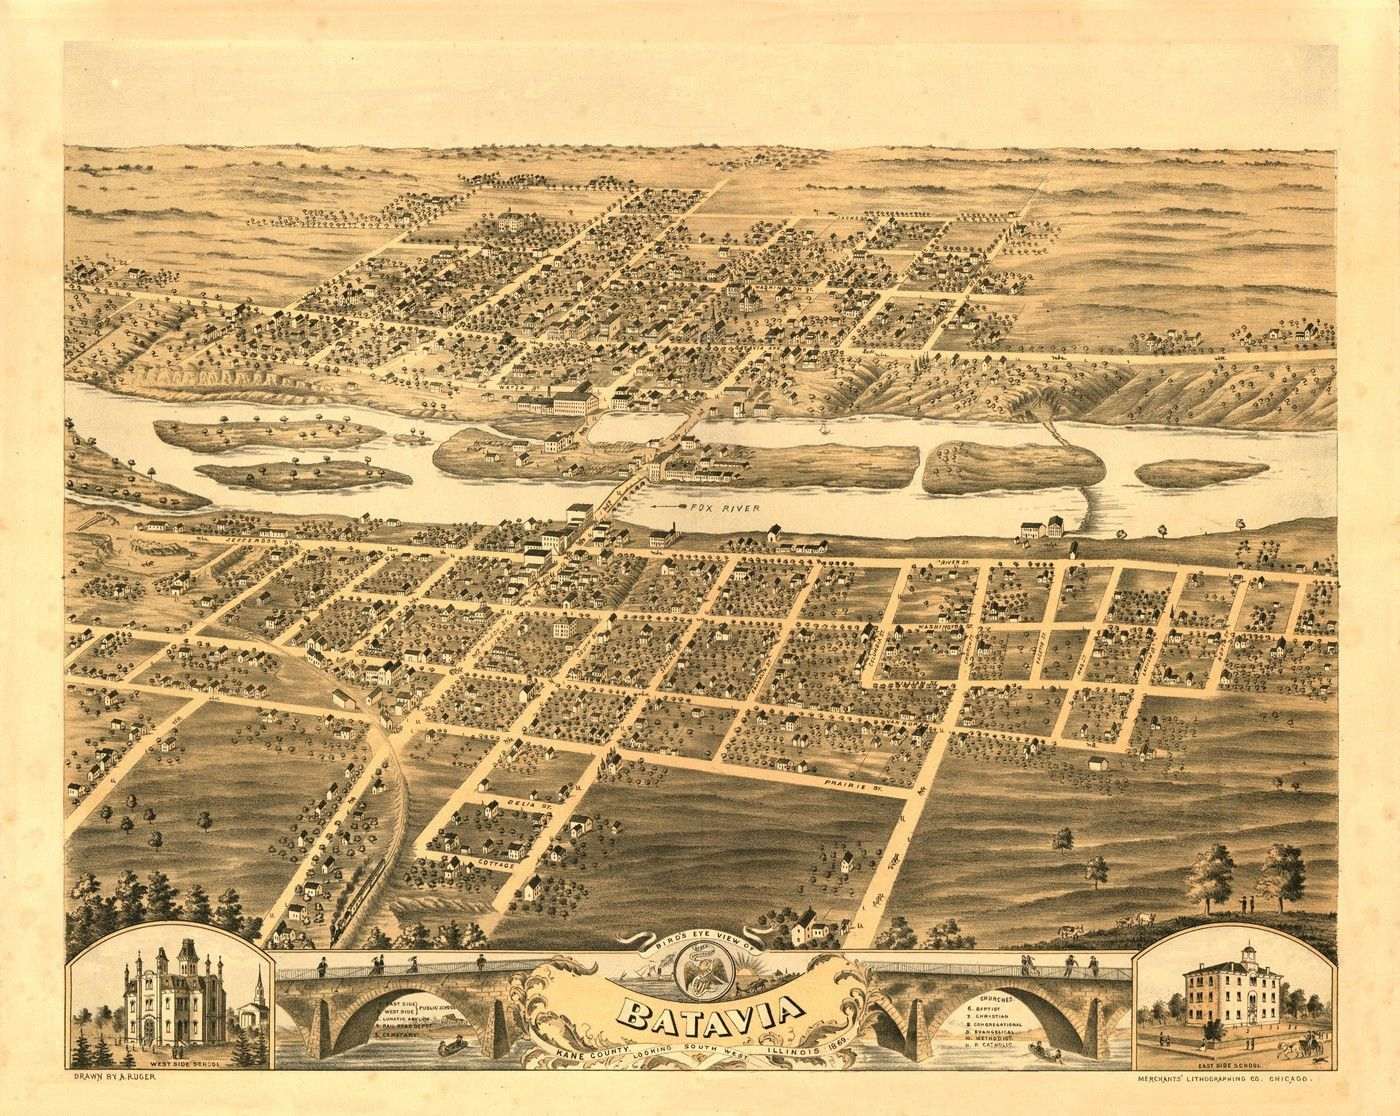 Illinois kane county carpentersville - Old Map Of Batavia Illinois 1869 Kane County Poster